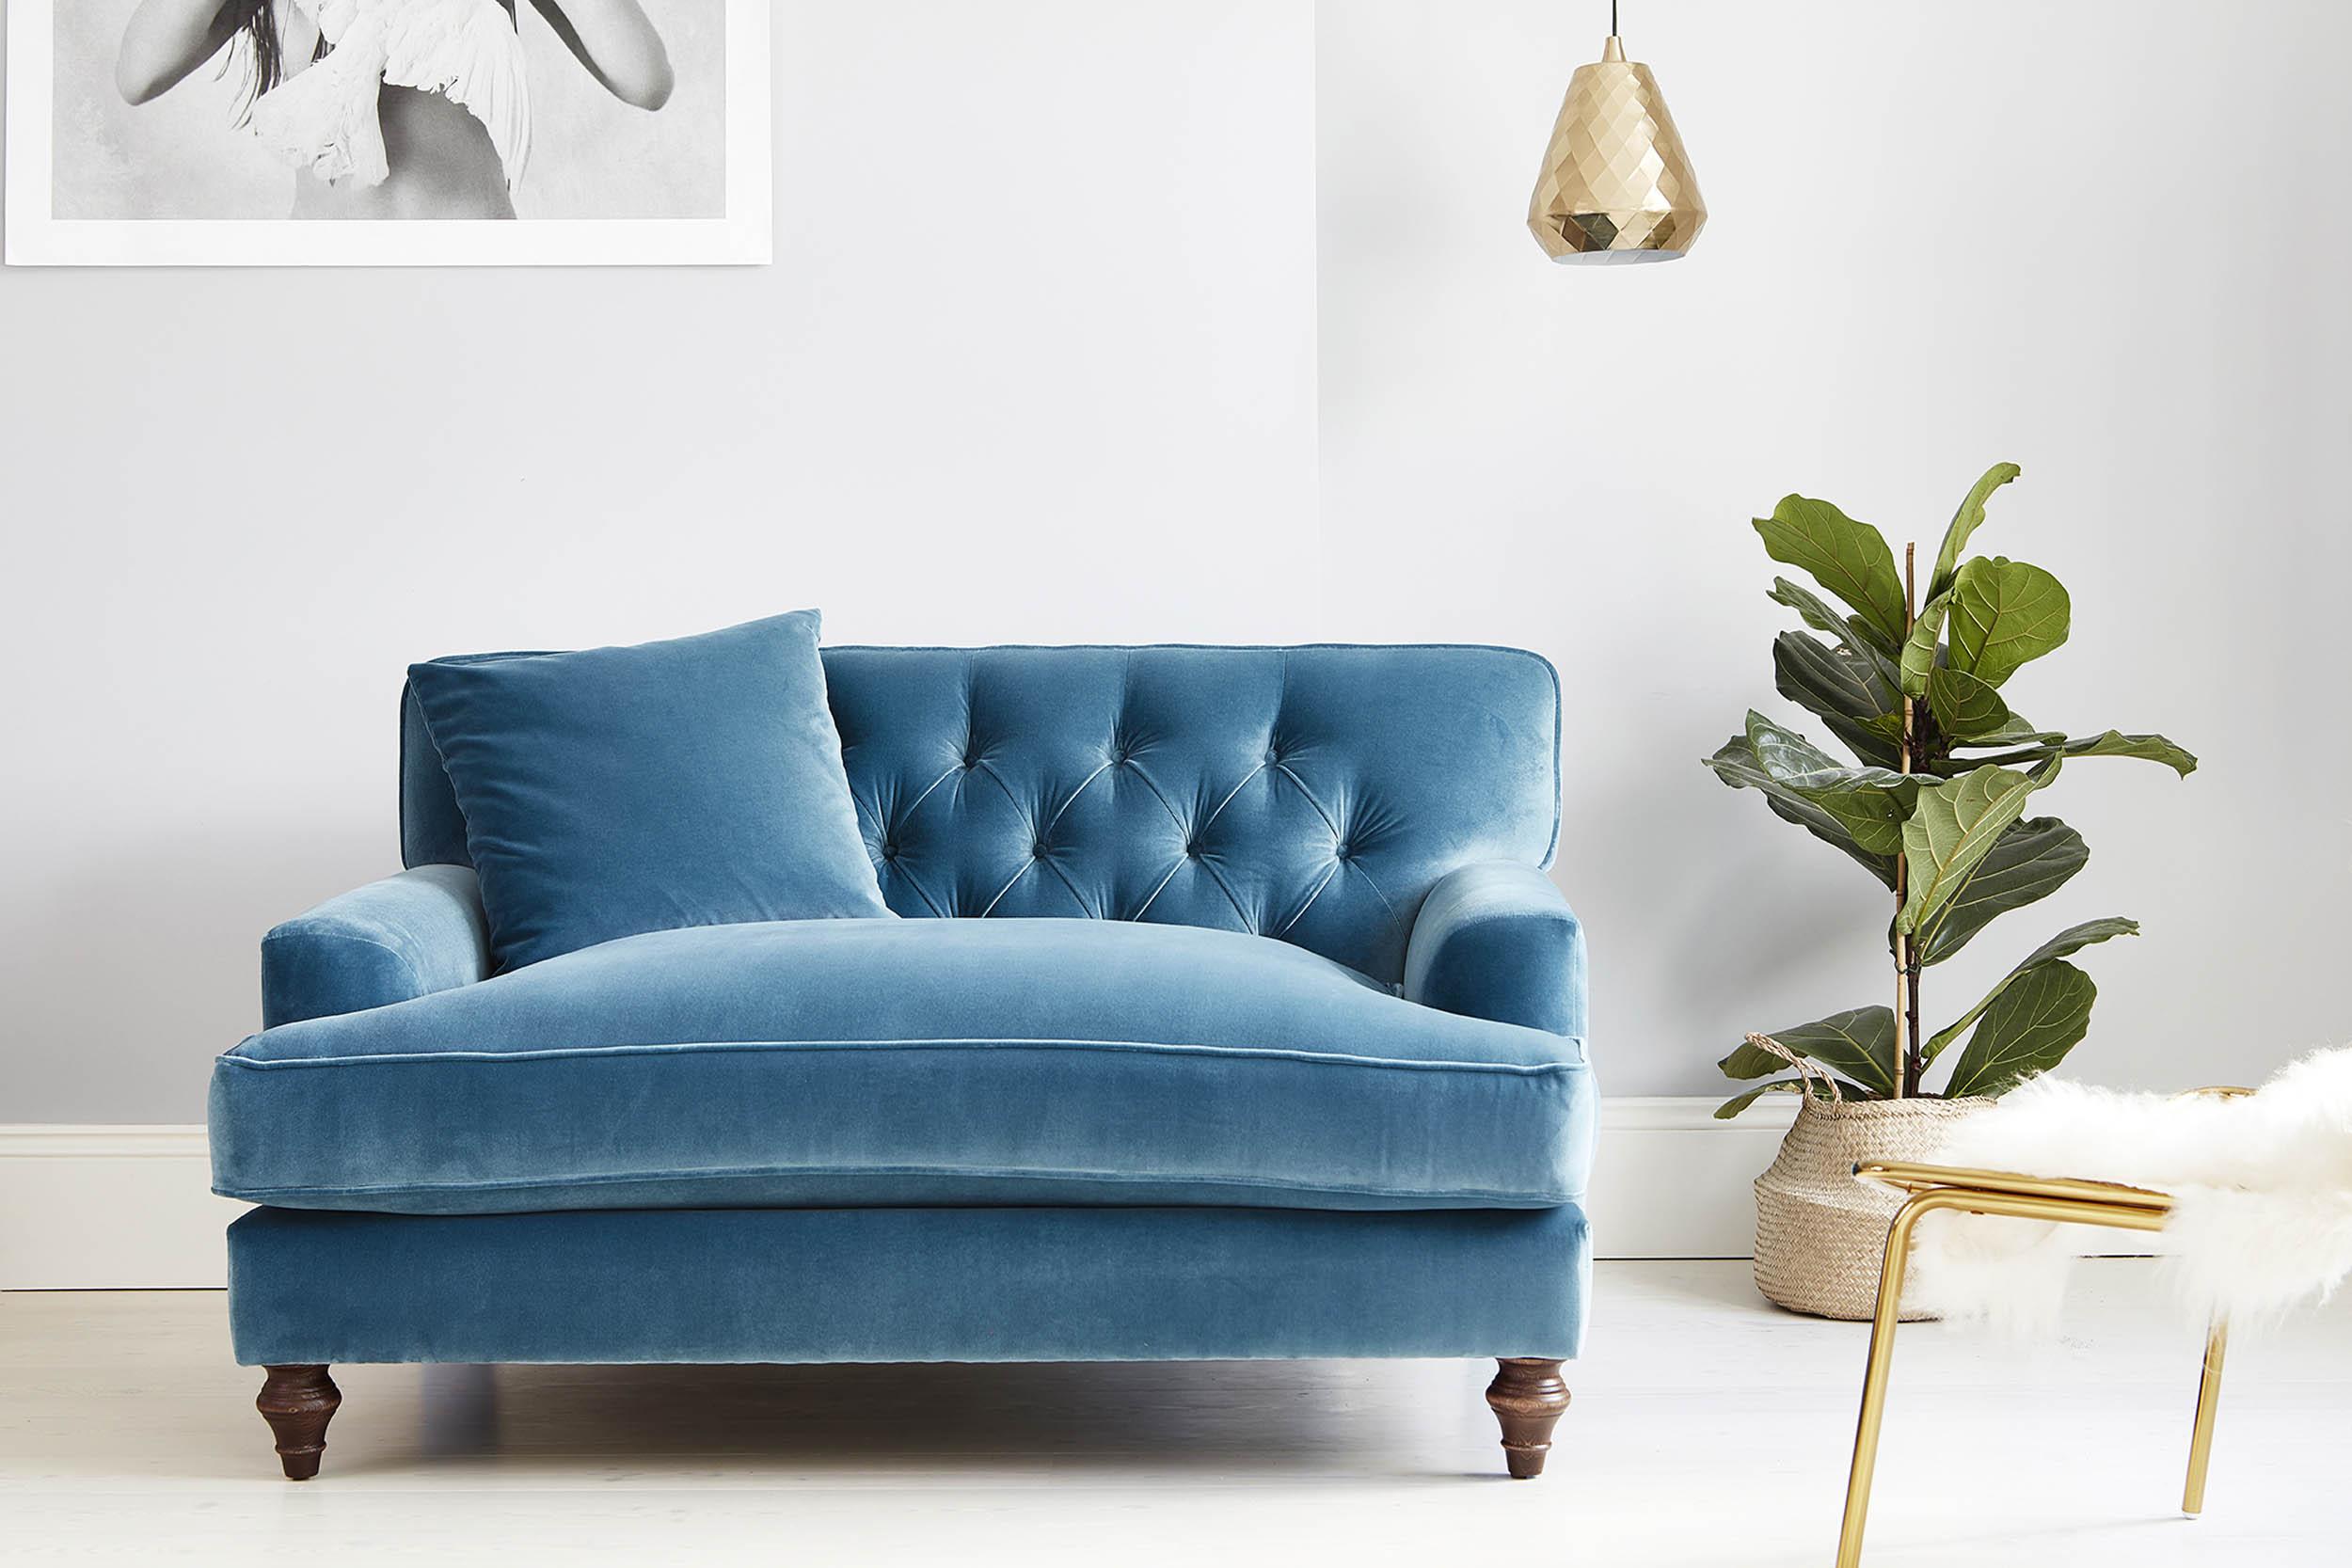 Rutlend+love+seat_012.jpg